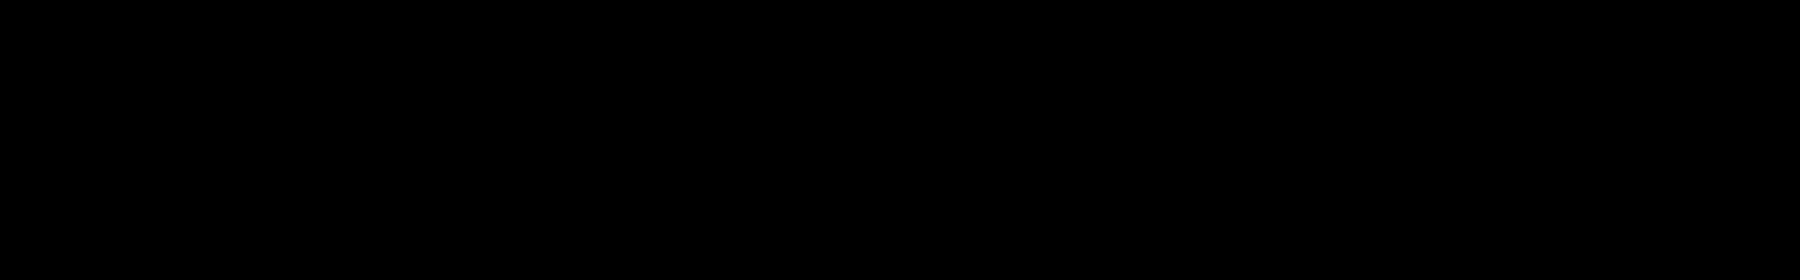 Sapphire audio waveform